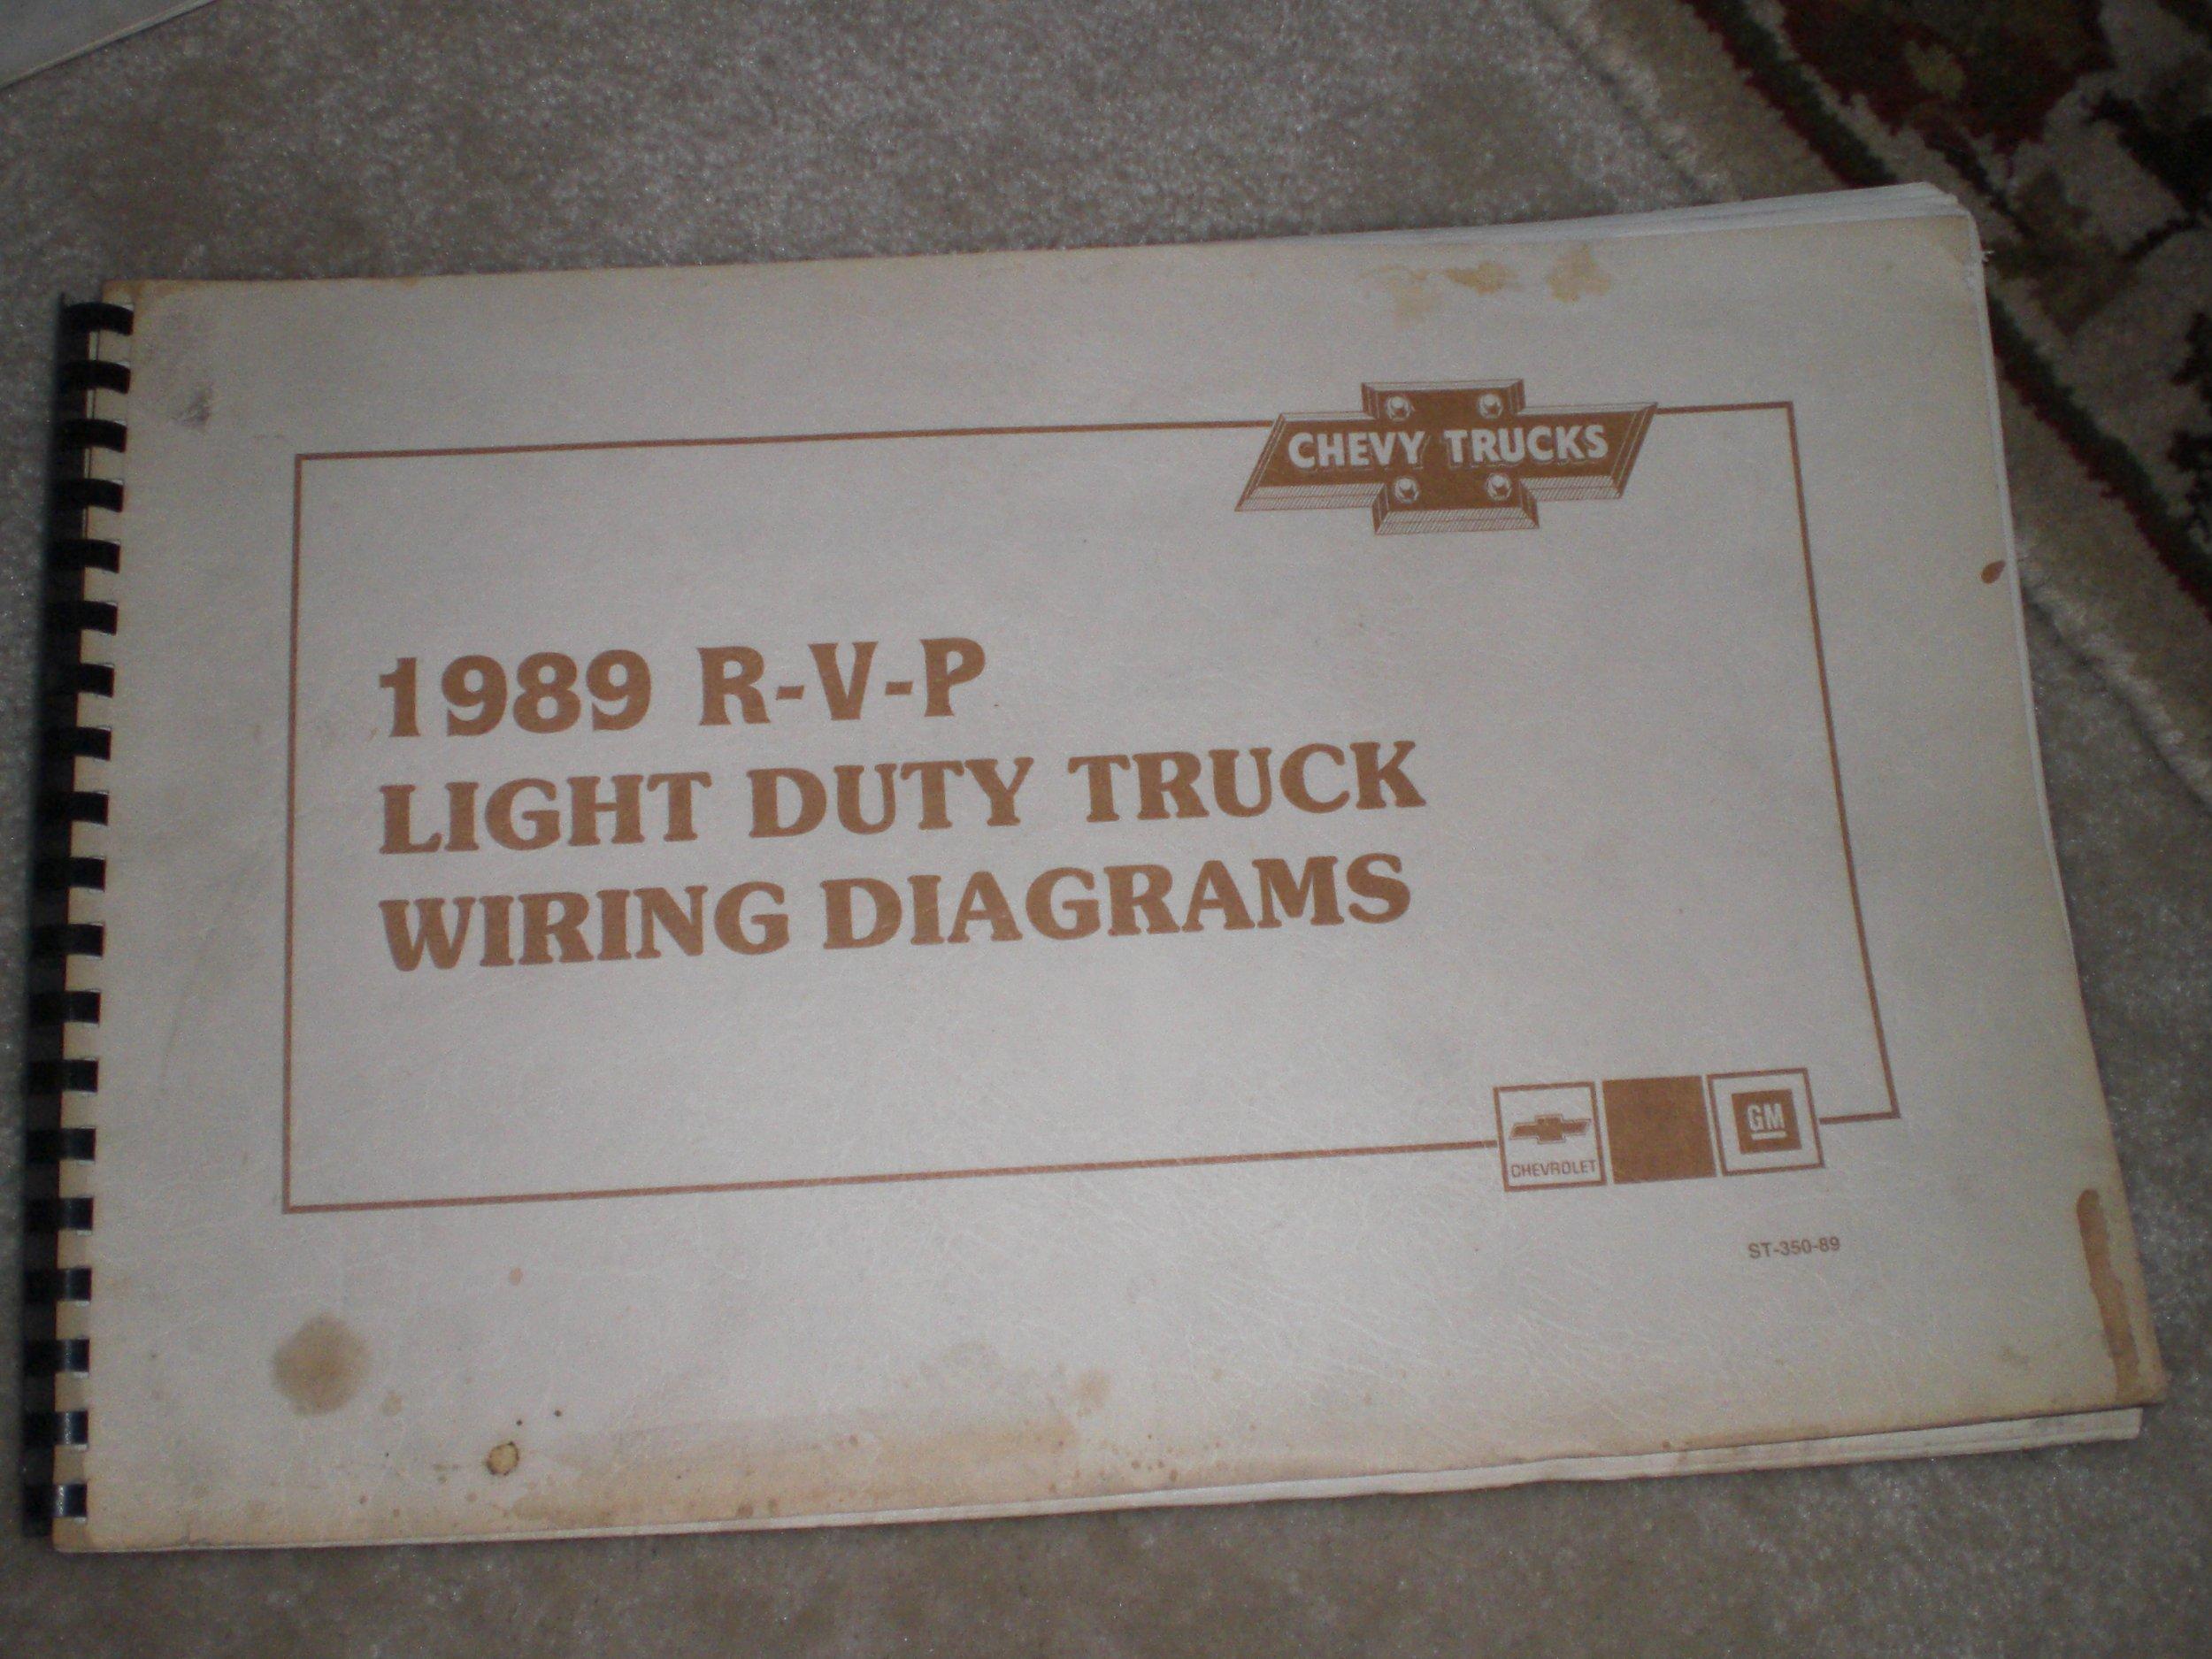 1989 Ford R-v-p Light Duty Truck Wiring Diagrams: general motors co.:  Amazon.com: Books